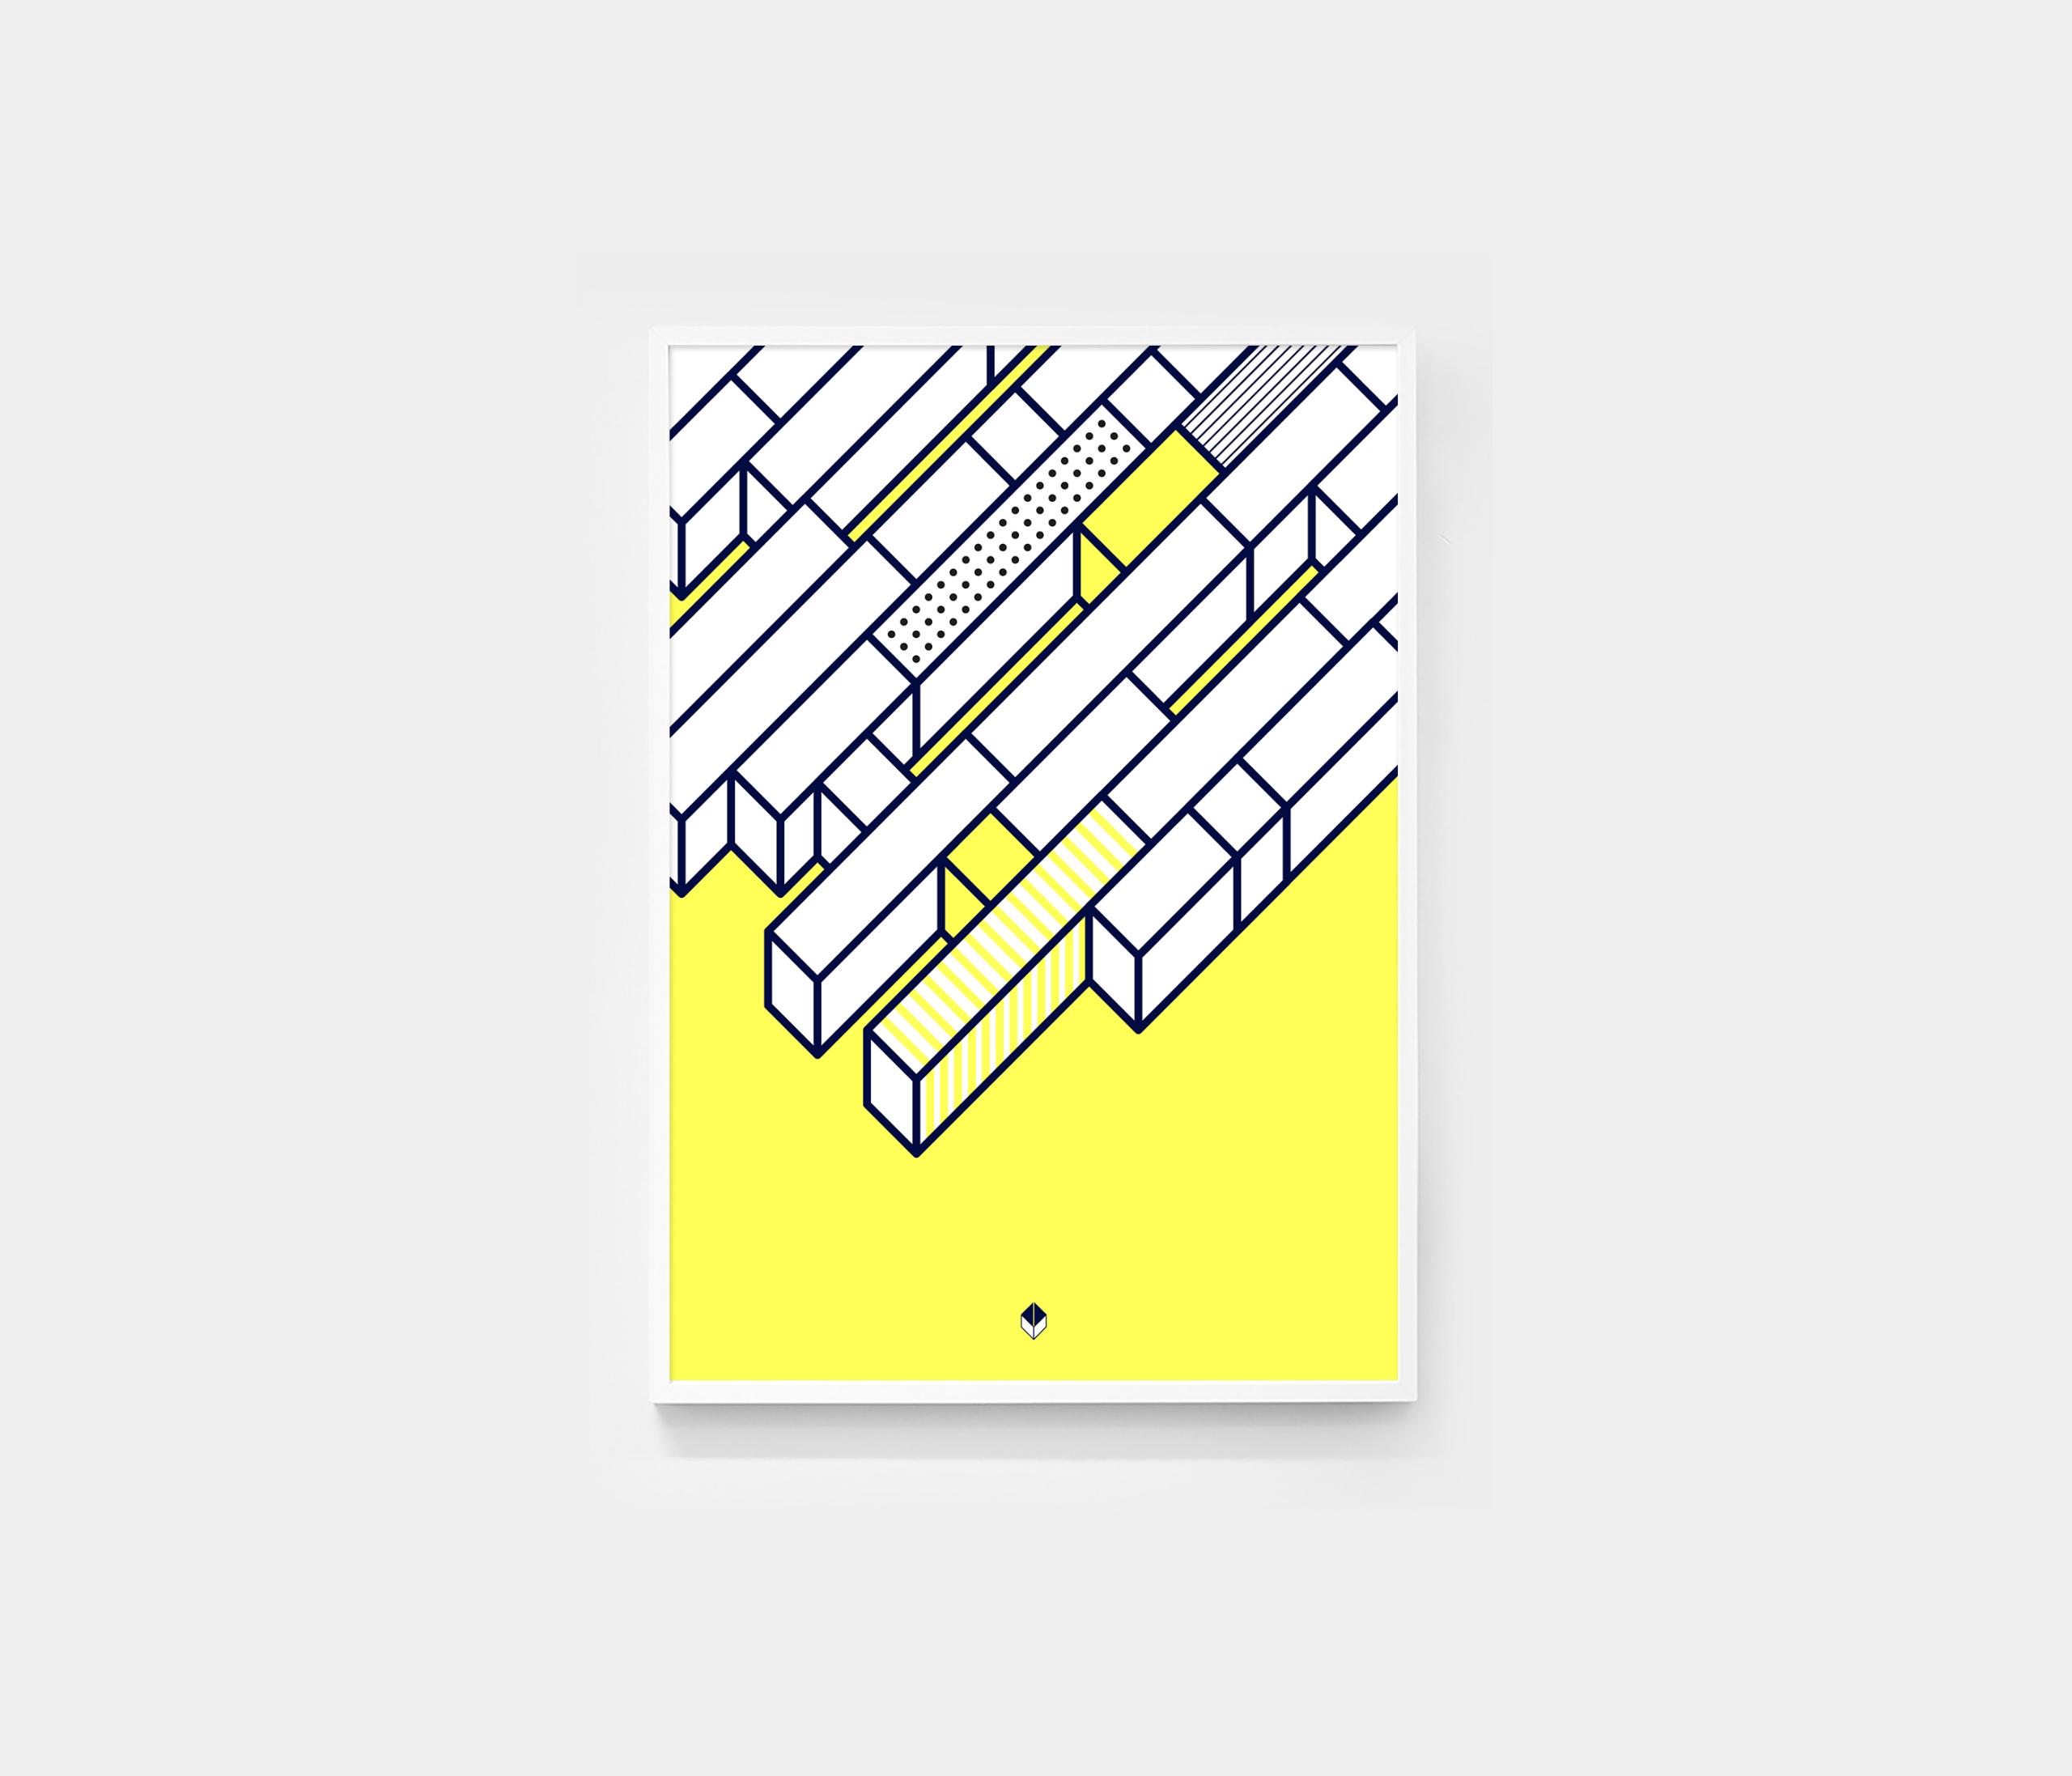 Square 1 - artwork,, design,, shapes, - andrebritz | ello